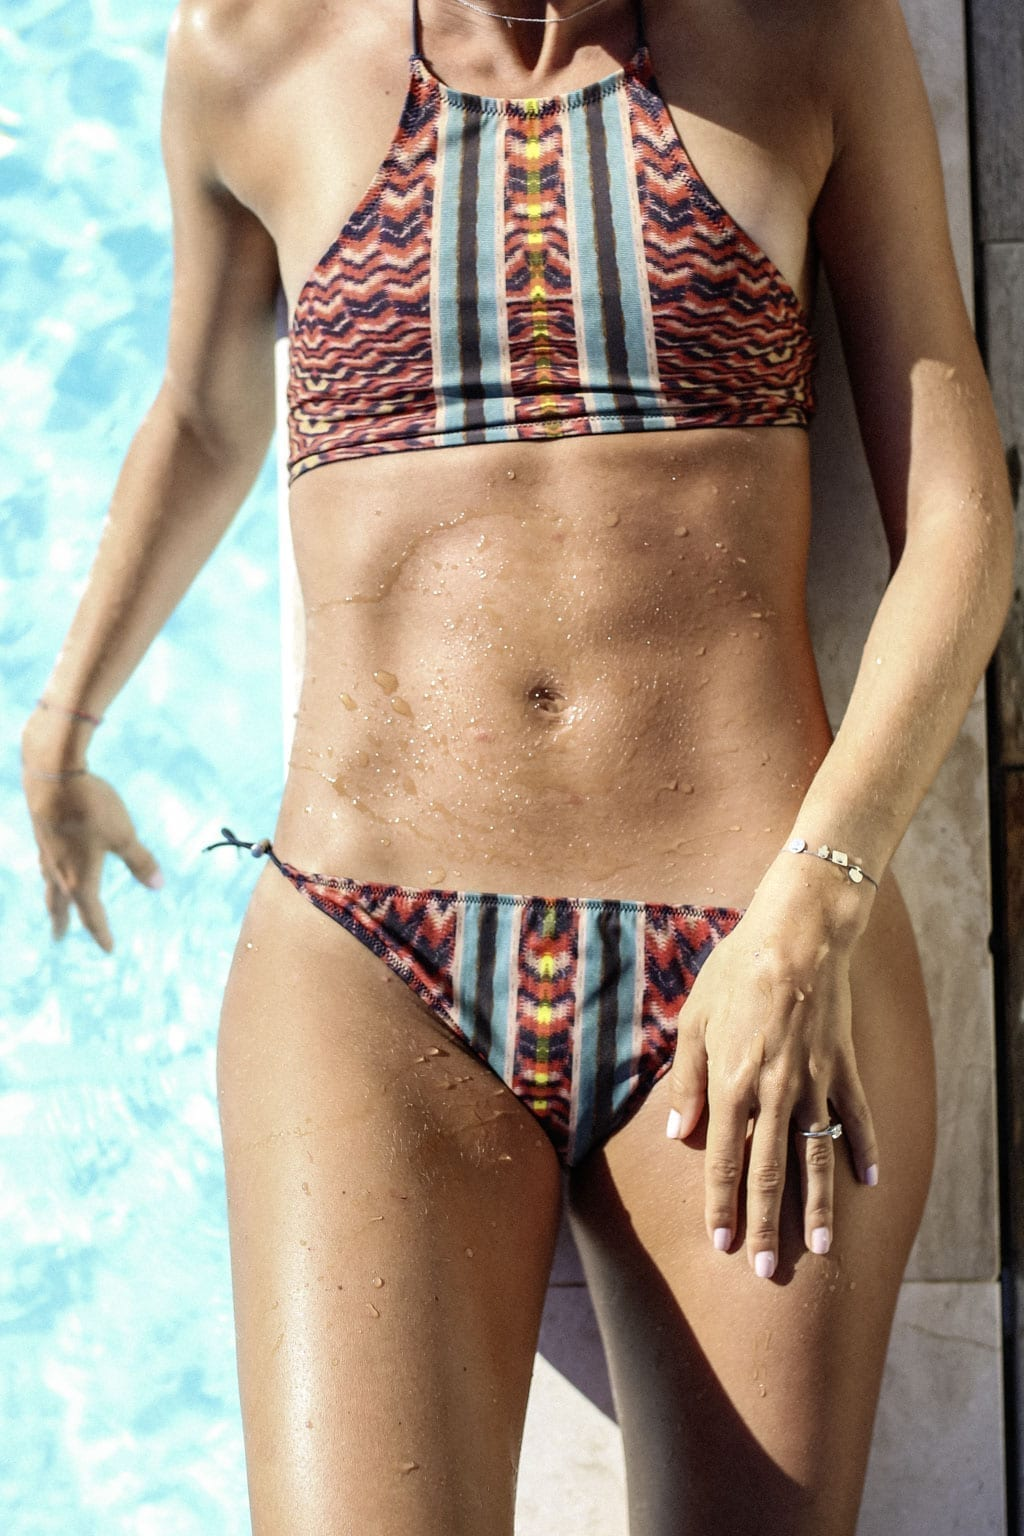 CK-1606_Sardinien-Sardegna-Sardinia-Italy-Italia-Fashion-Blog-Beach-Caribbean-Dress-Blonde-Karin-Kaswurm-Bikini-Kiini-2-2